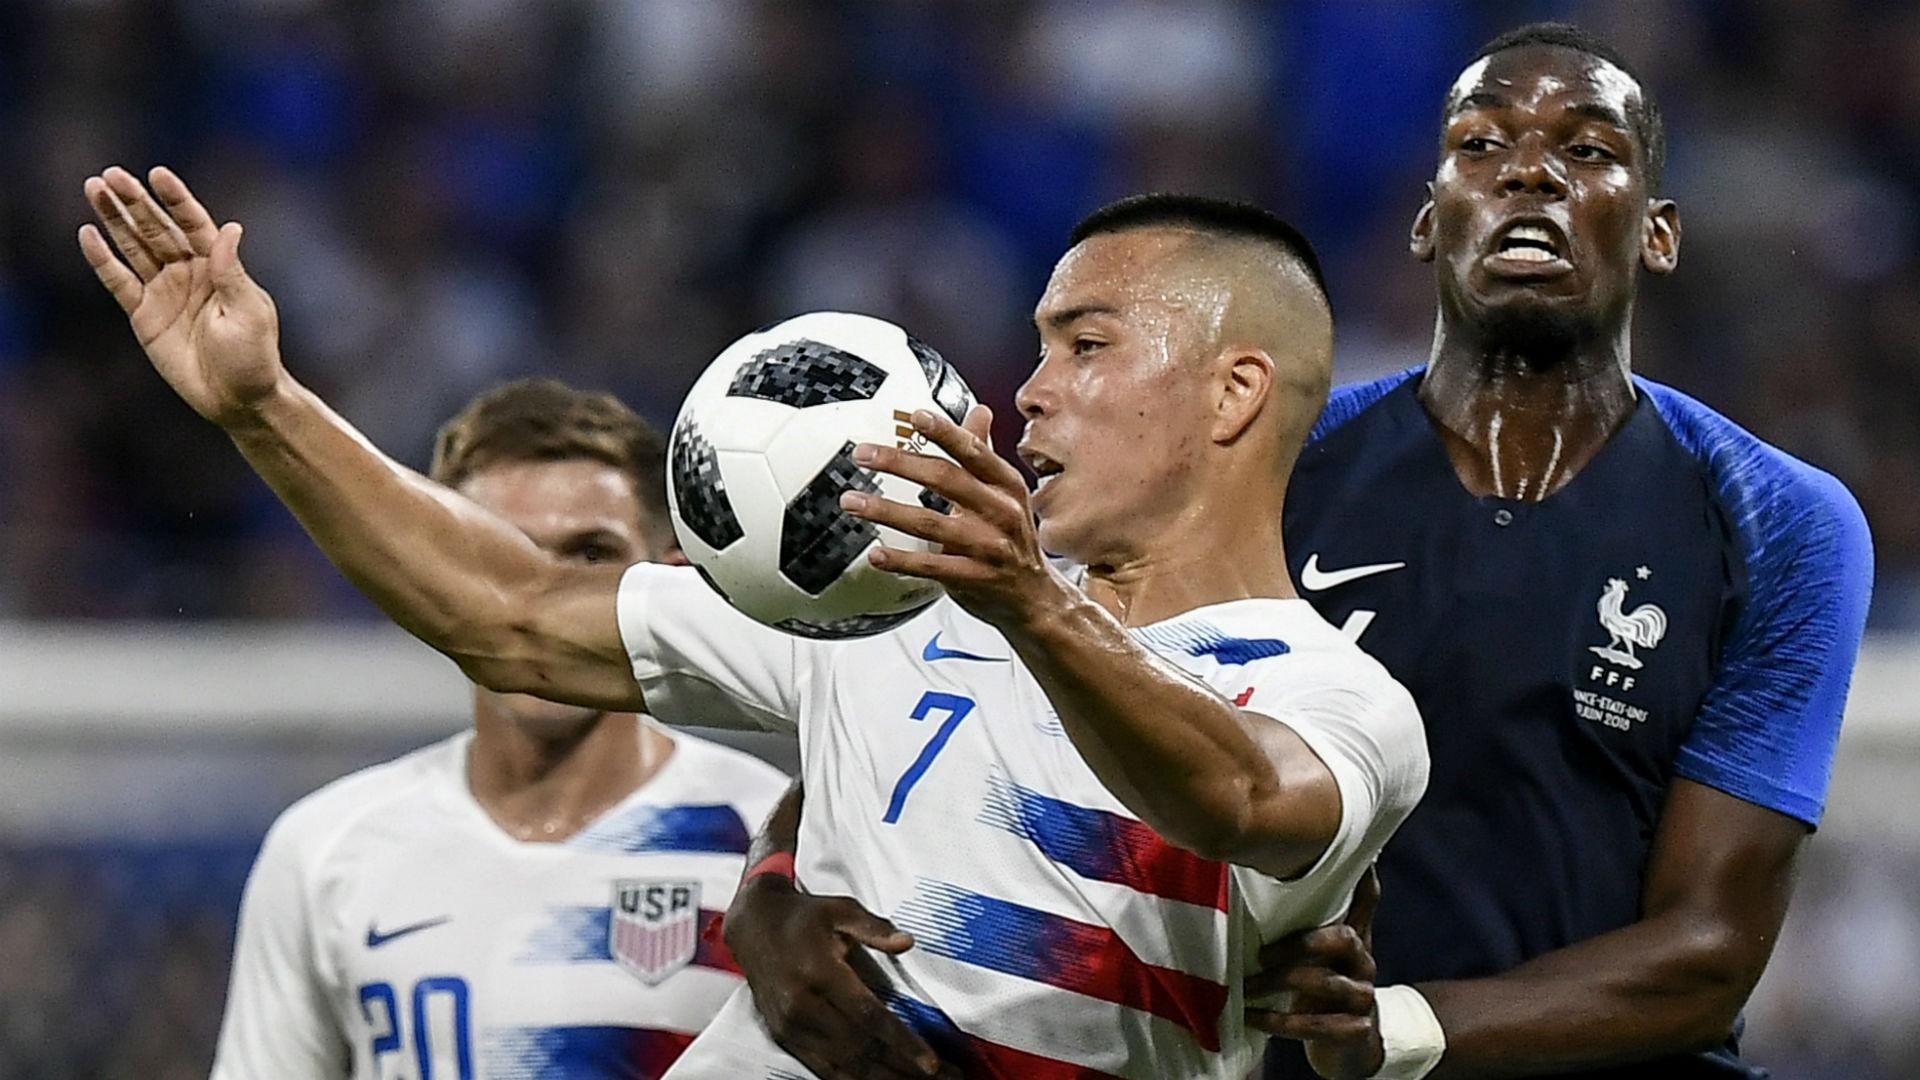 Paul Pogba Bobby Wood France USA international friendly 2018